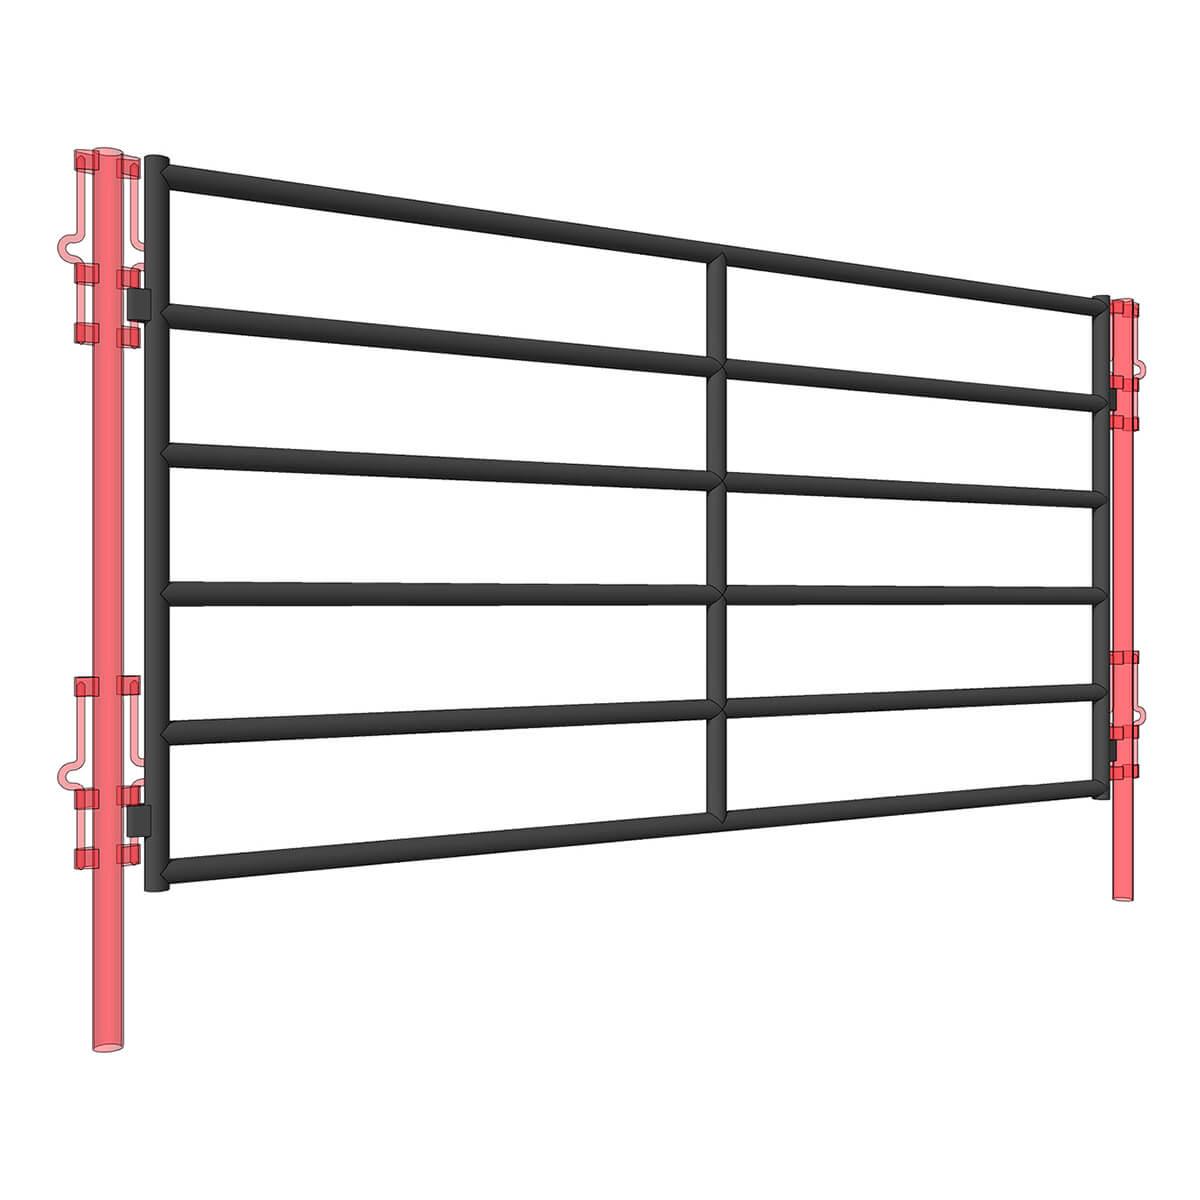 500 Series Panel - 10-ft